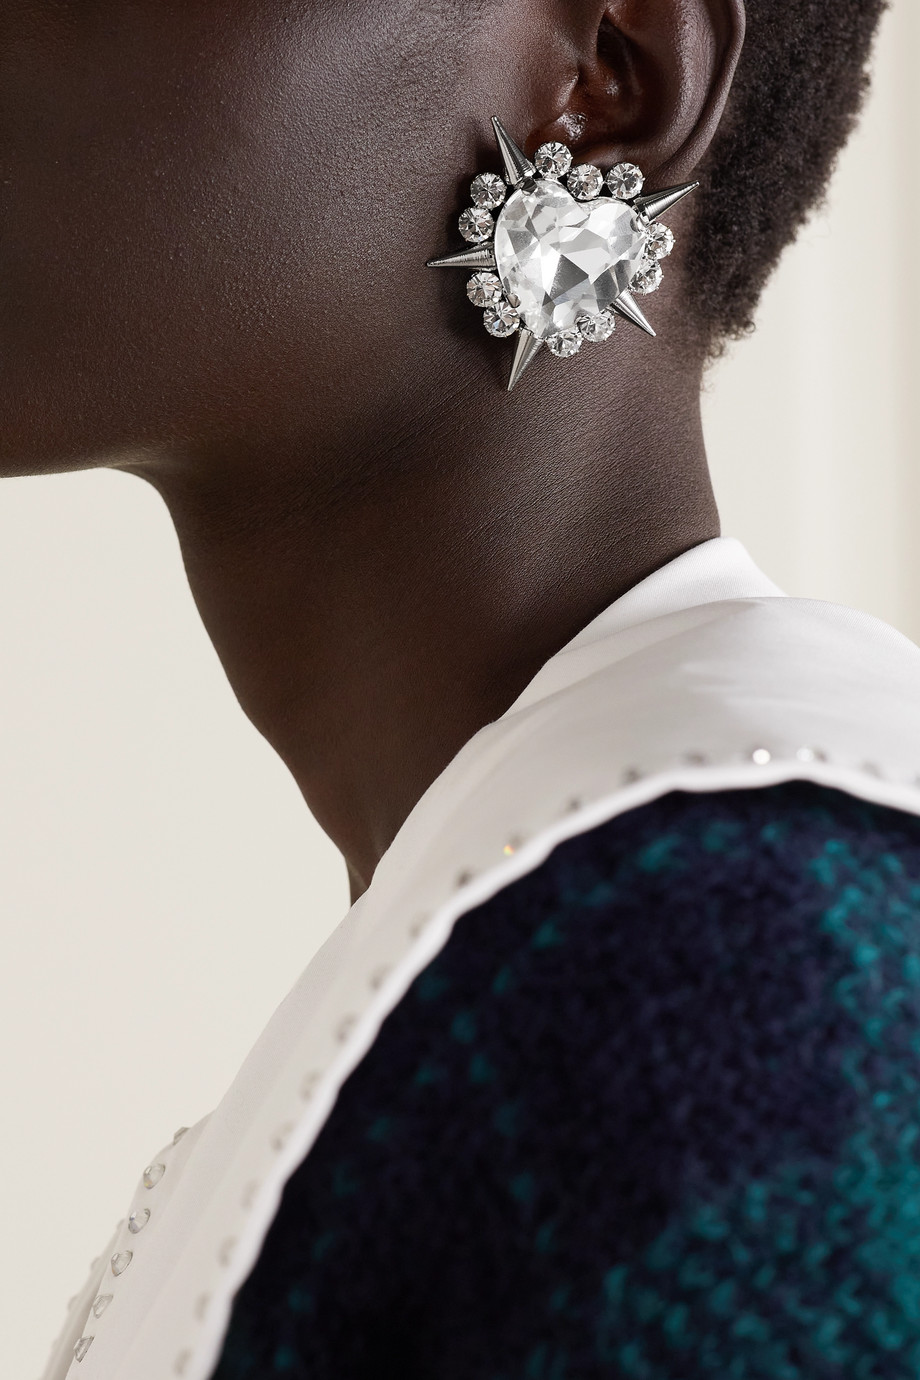 Alessandra Rich Große silberfarbene Ohrclips mit Kristallen